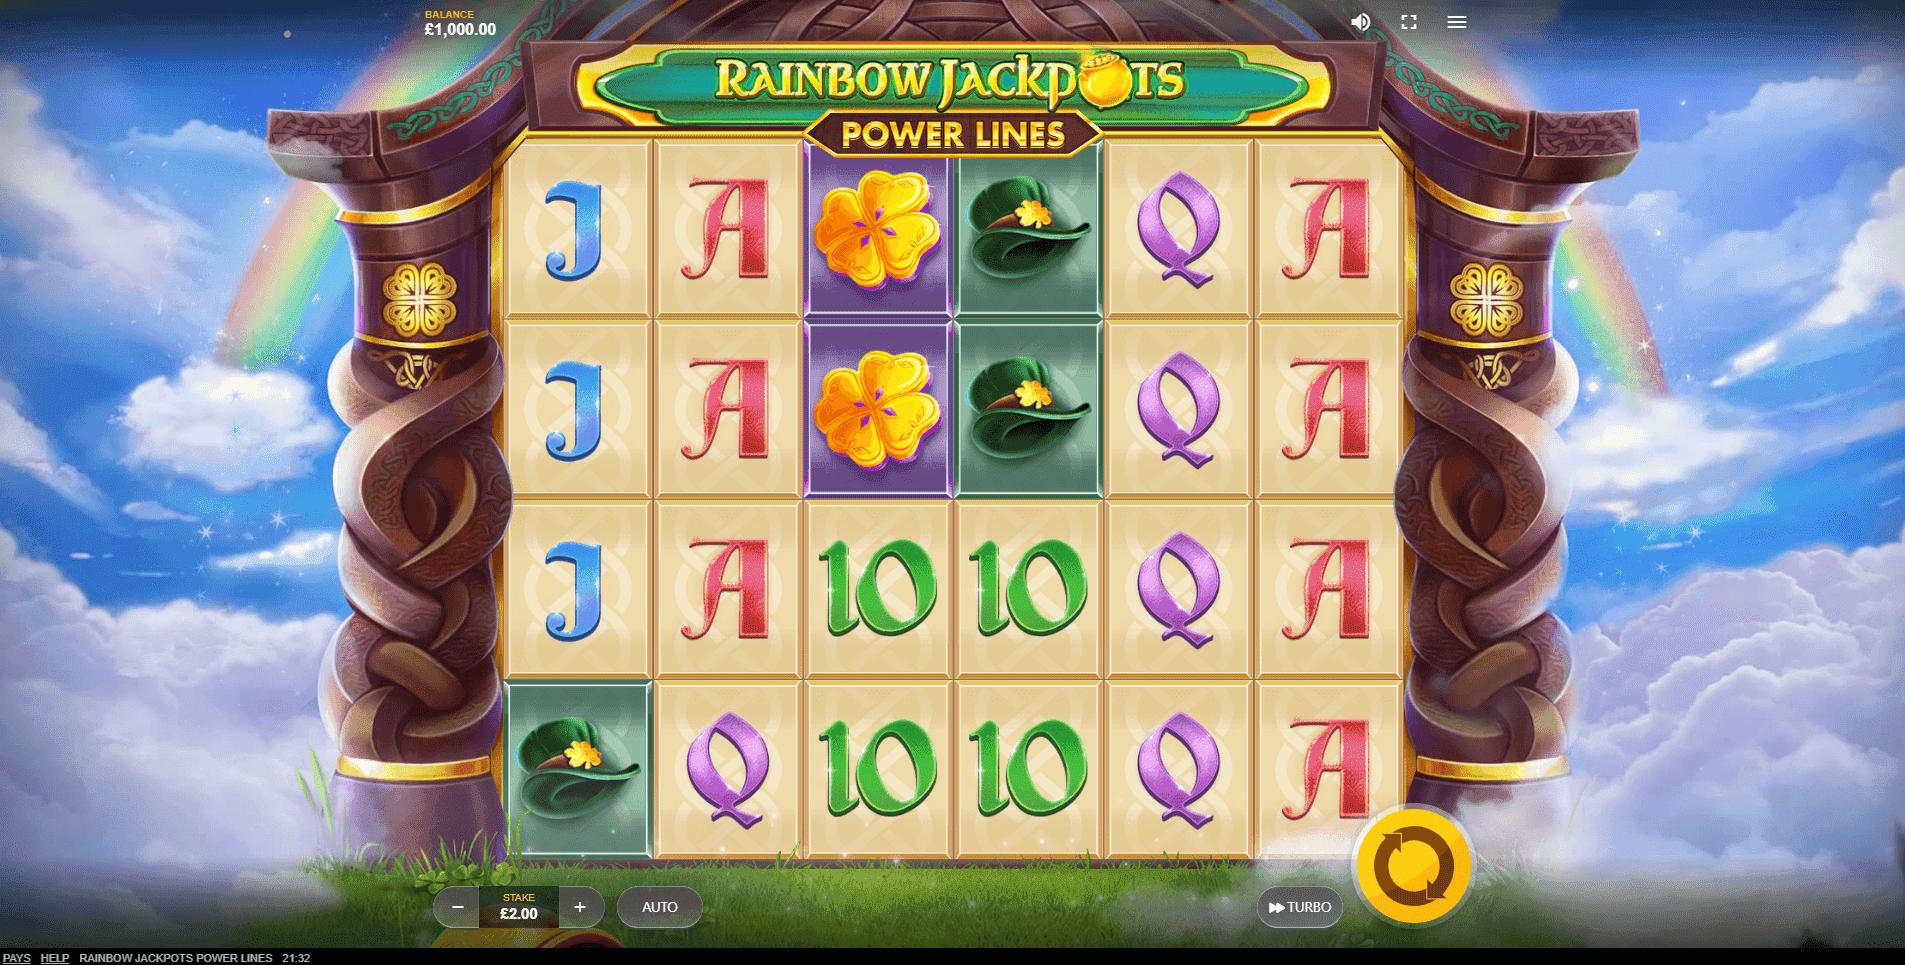 Rainbow Jackpots Power Lines slot machine screenshot